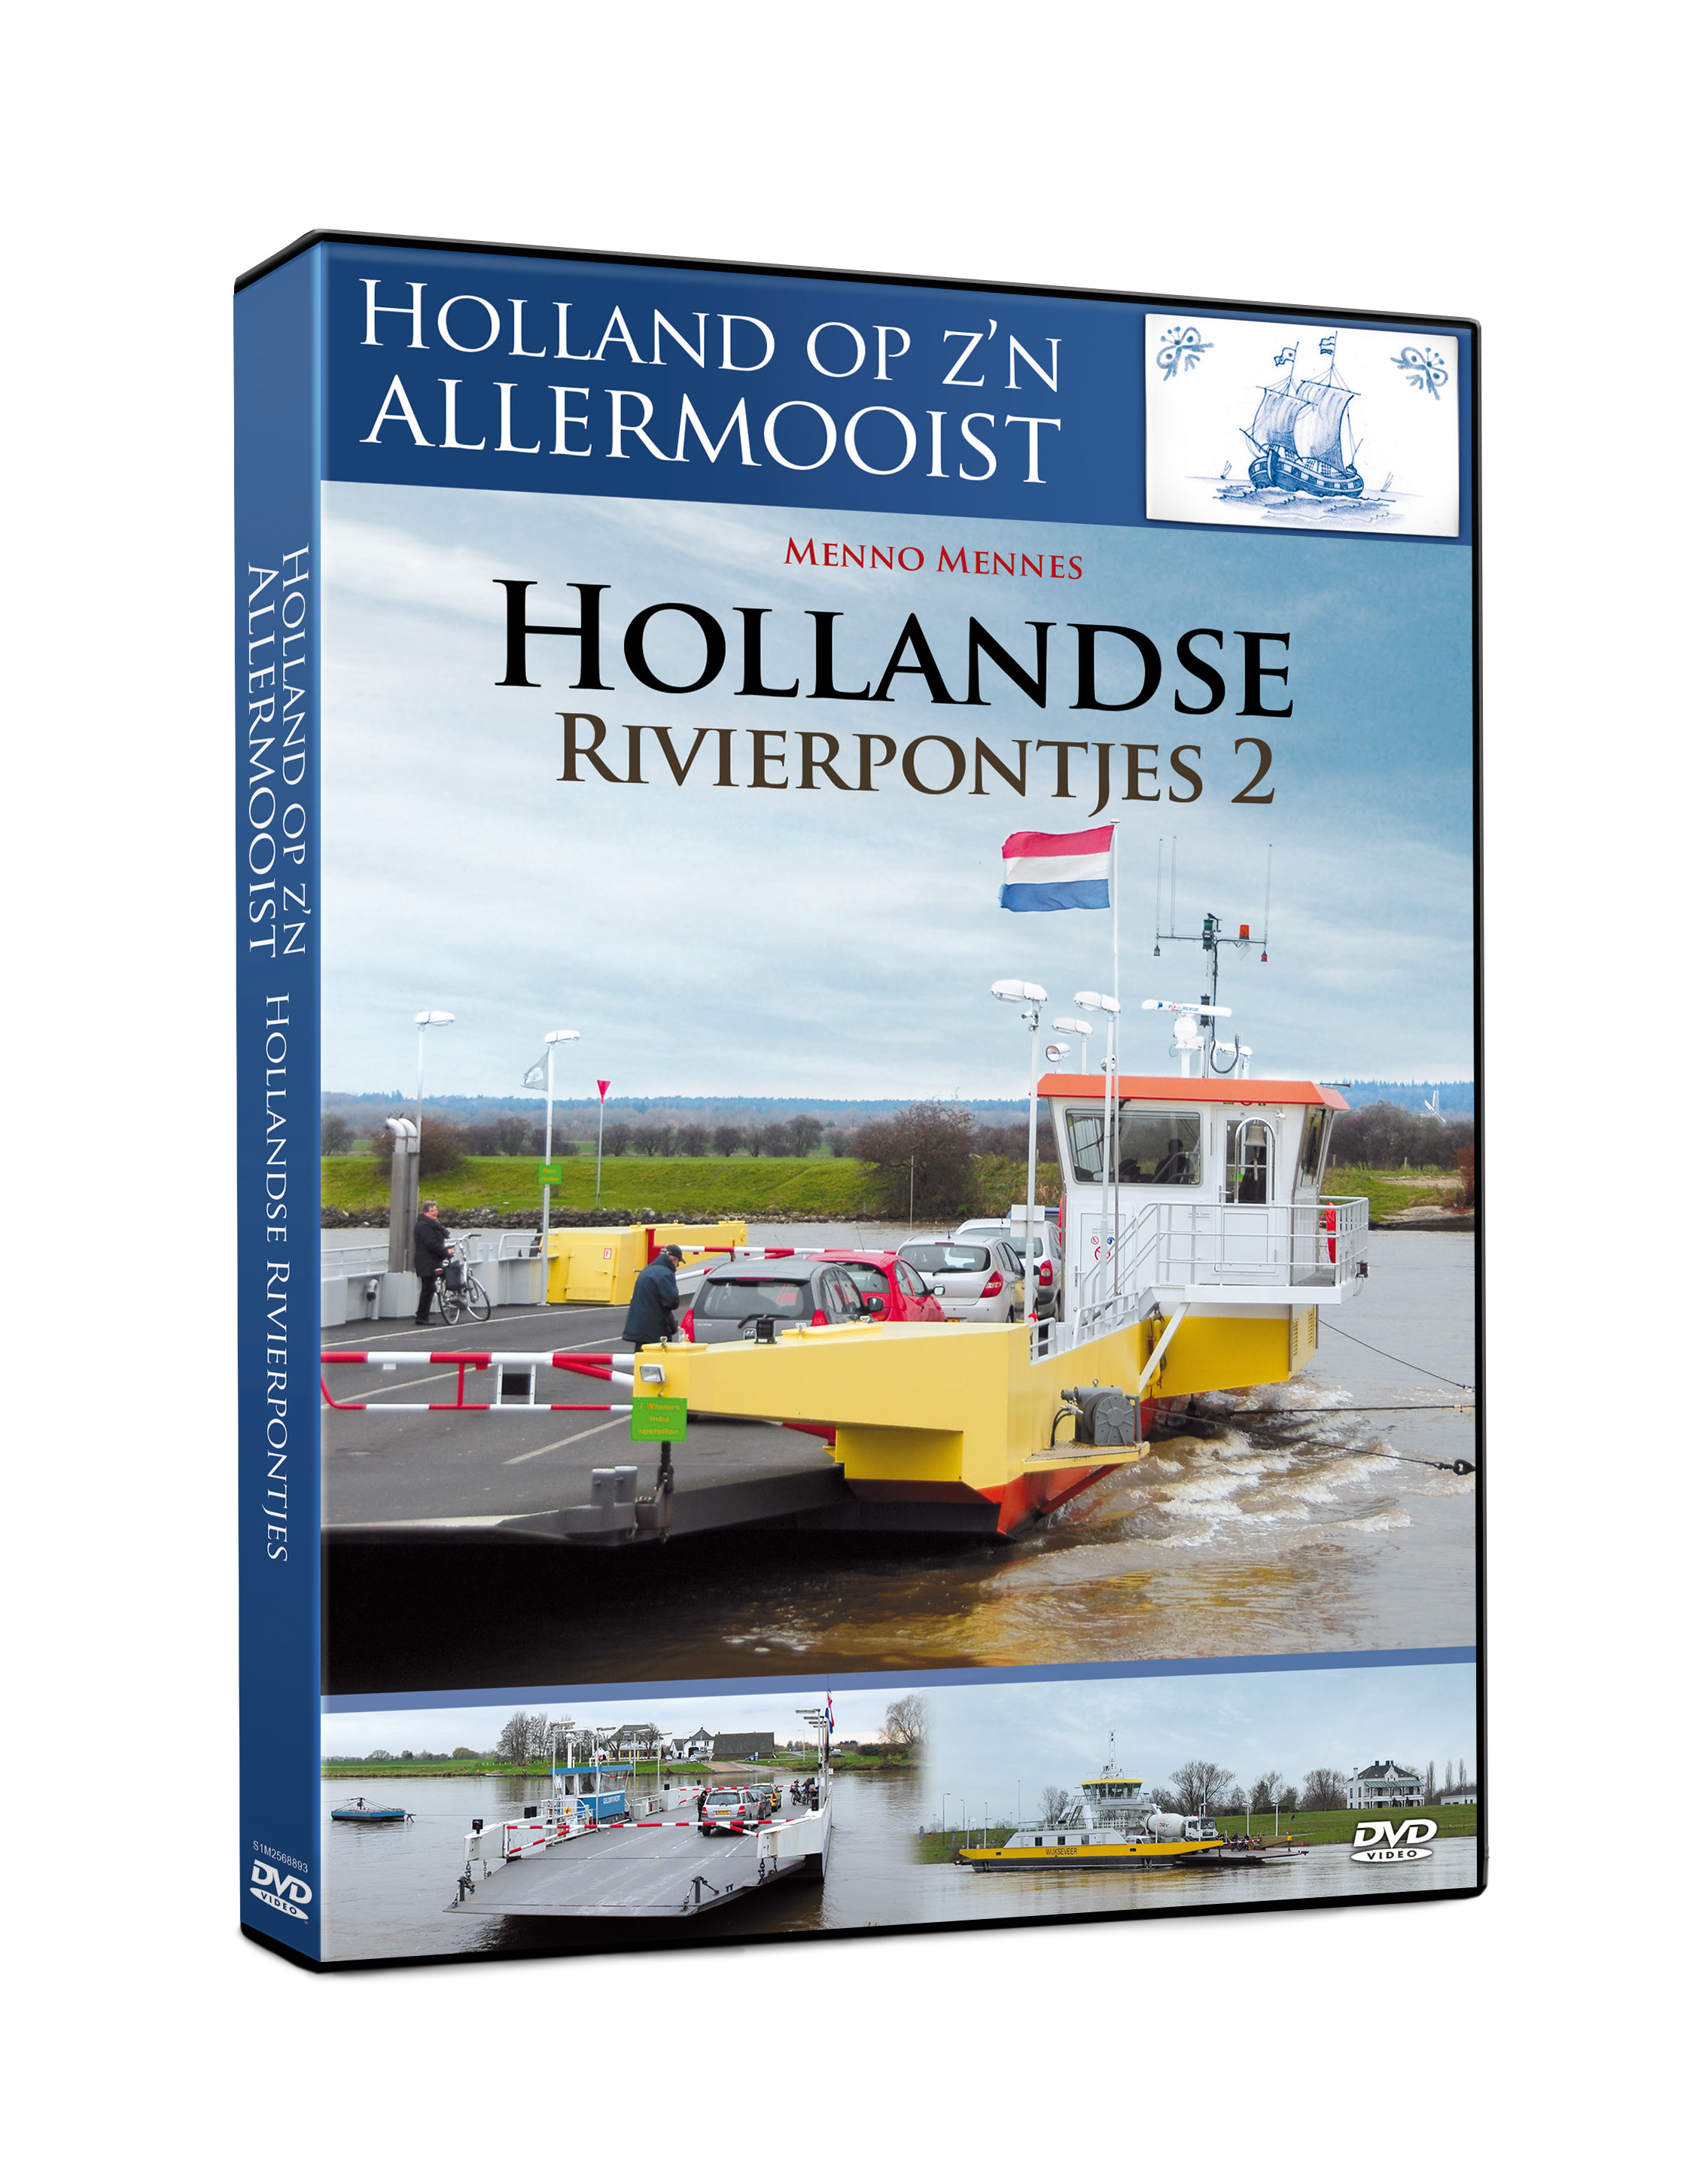 Holland op zijn allermooist - Rivierpont